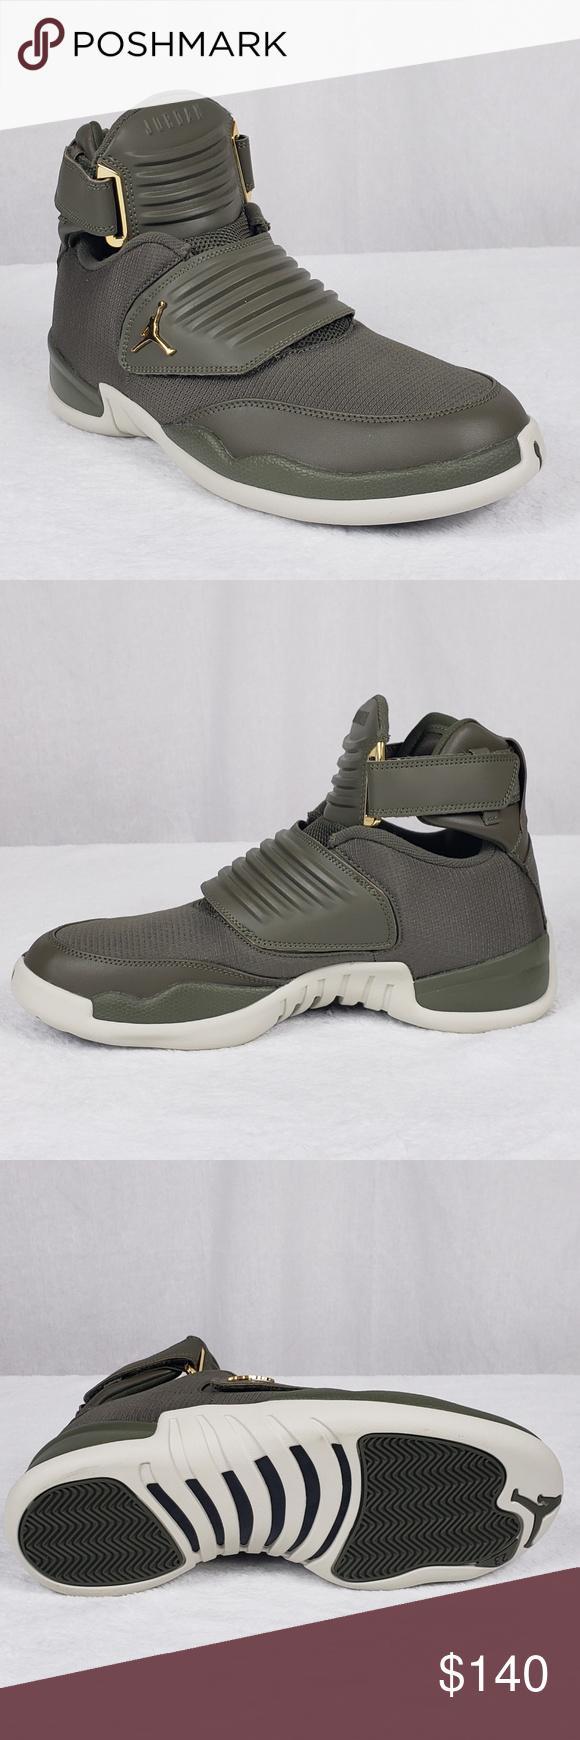 a9b5baa9db5 Jordan Generation 23 Medium Olive/Medium Size 11 New without box Men's size 11  Jordan Shoes Athletic Shoes